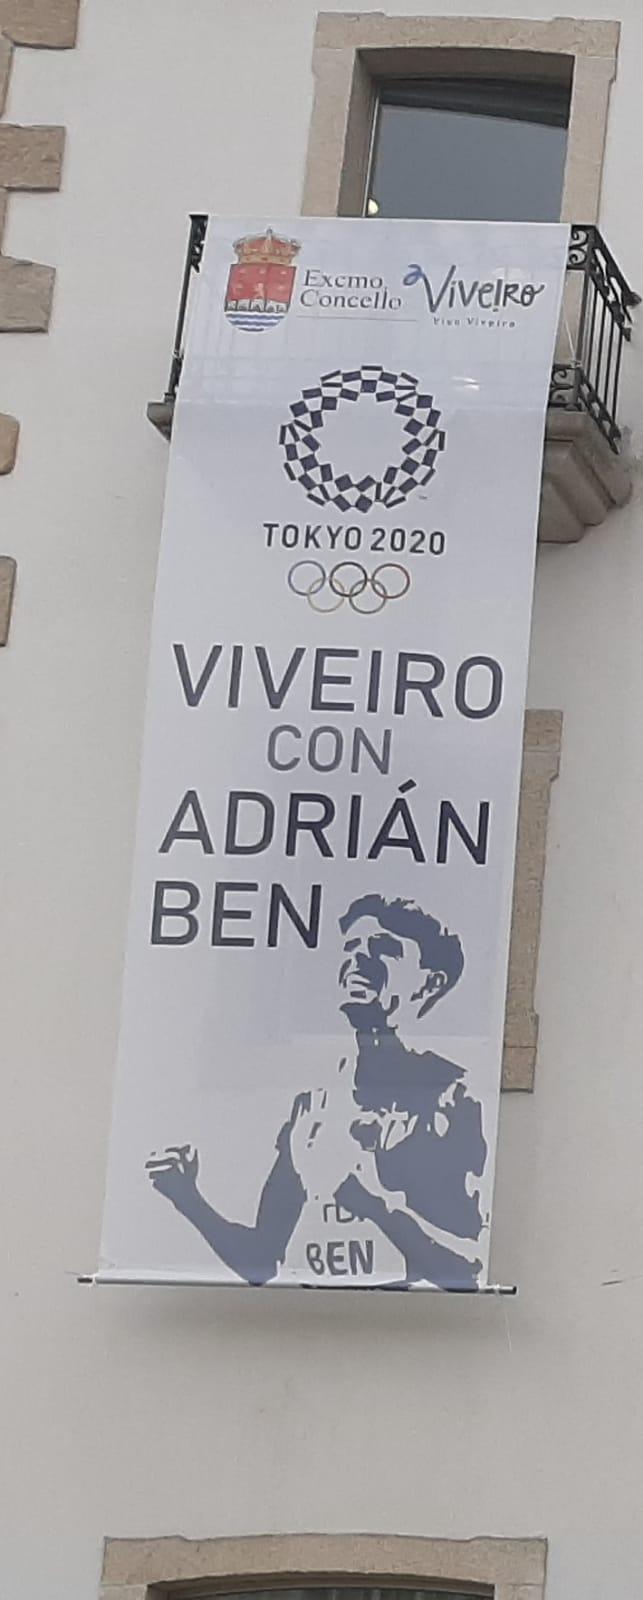 ADRIÁN BEN